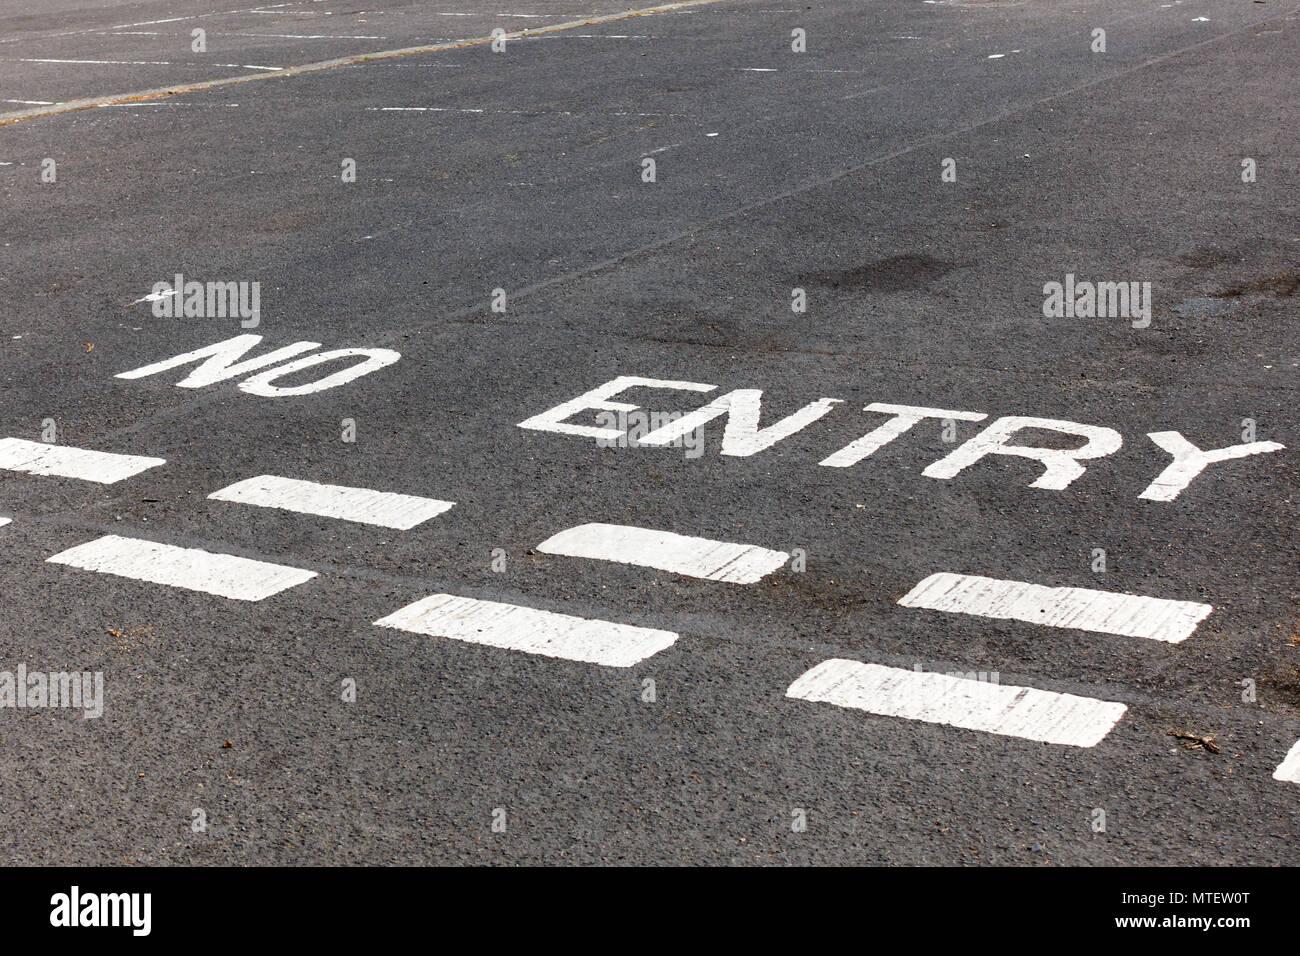 British no entry road markings - Stock Image